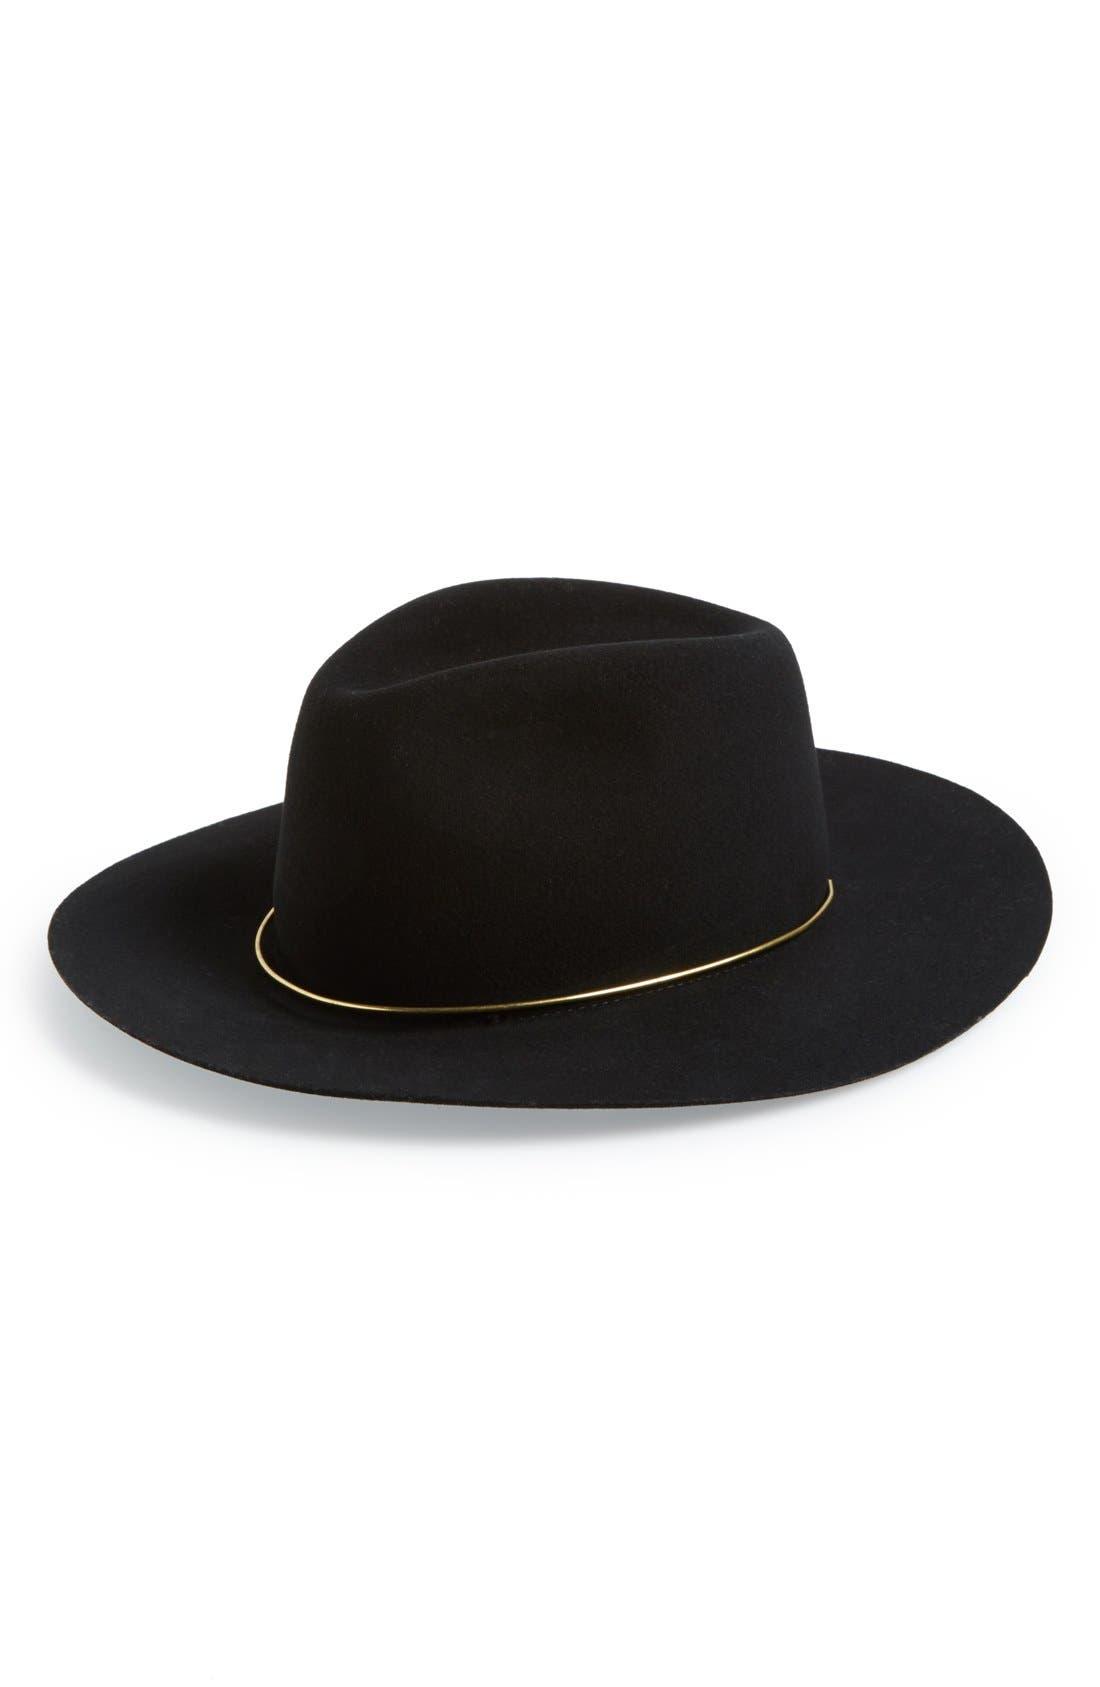 'Savoy' Hat,                         Main,                         color, Black